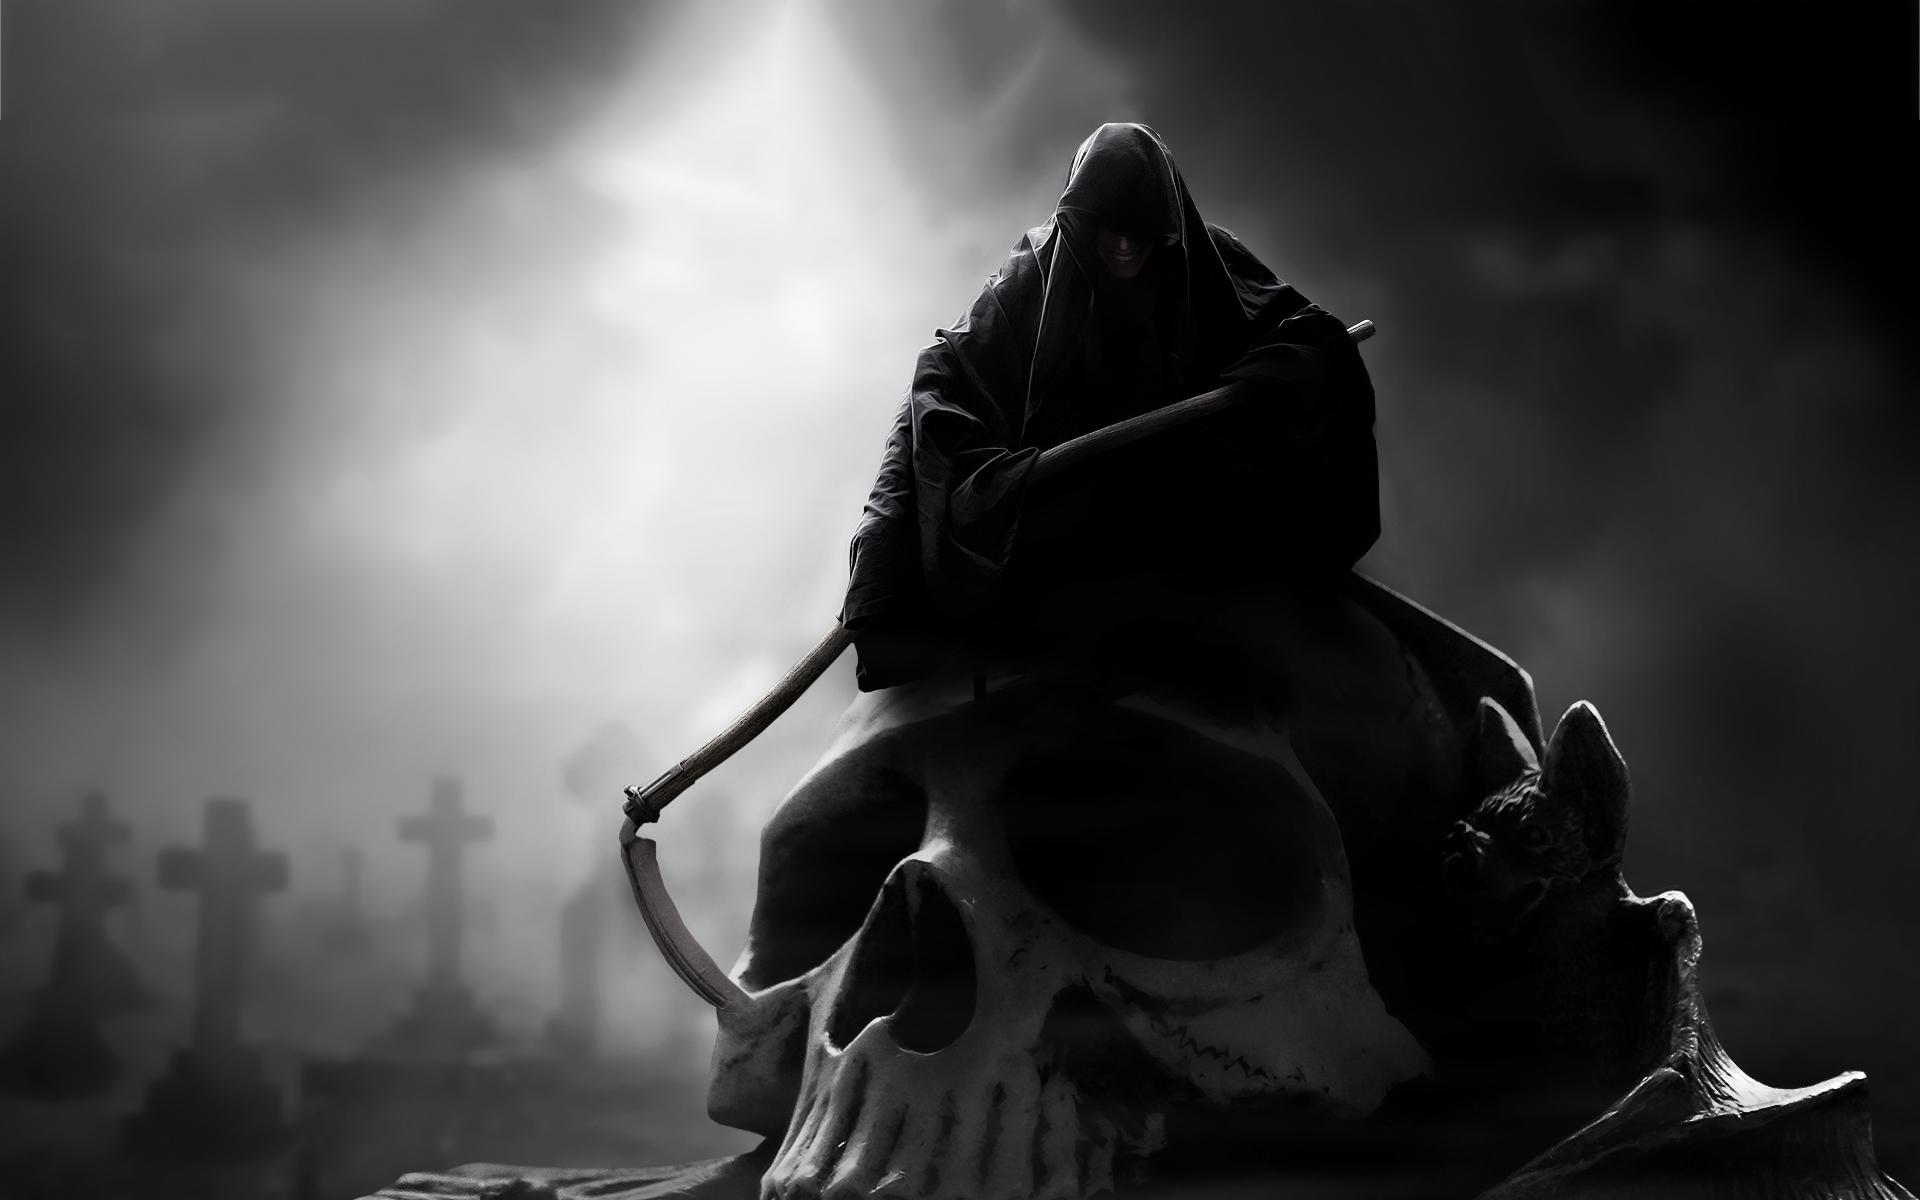 Grim Reaper Wallpaper HD 1920x1200